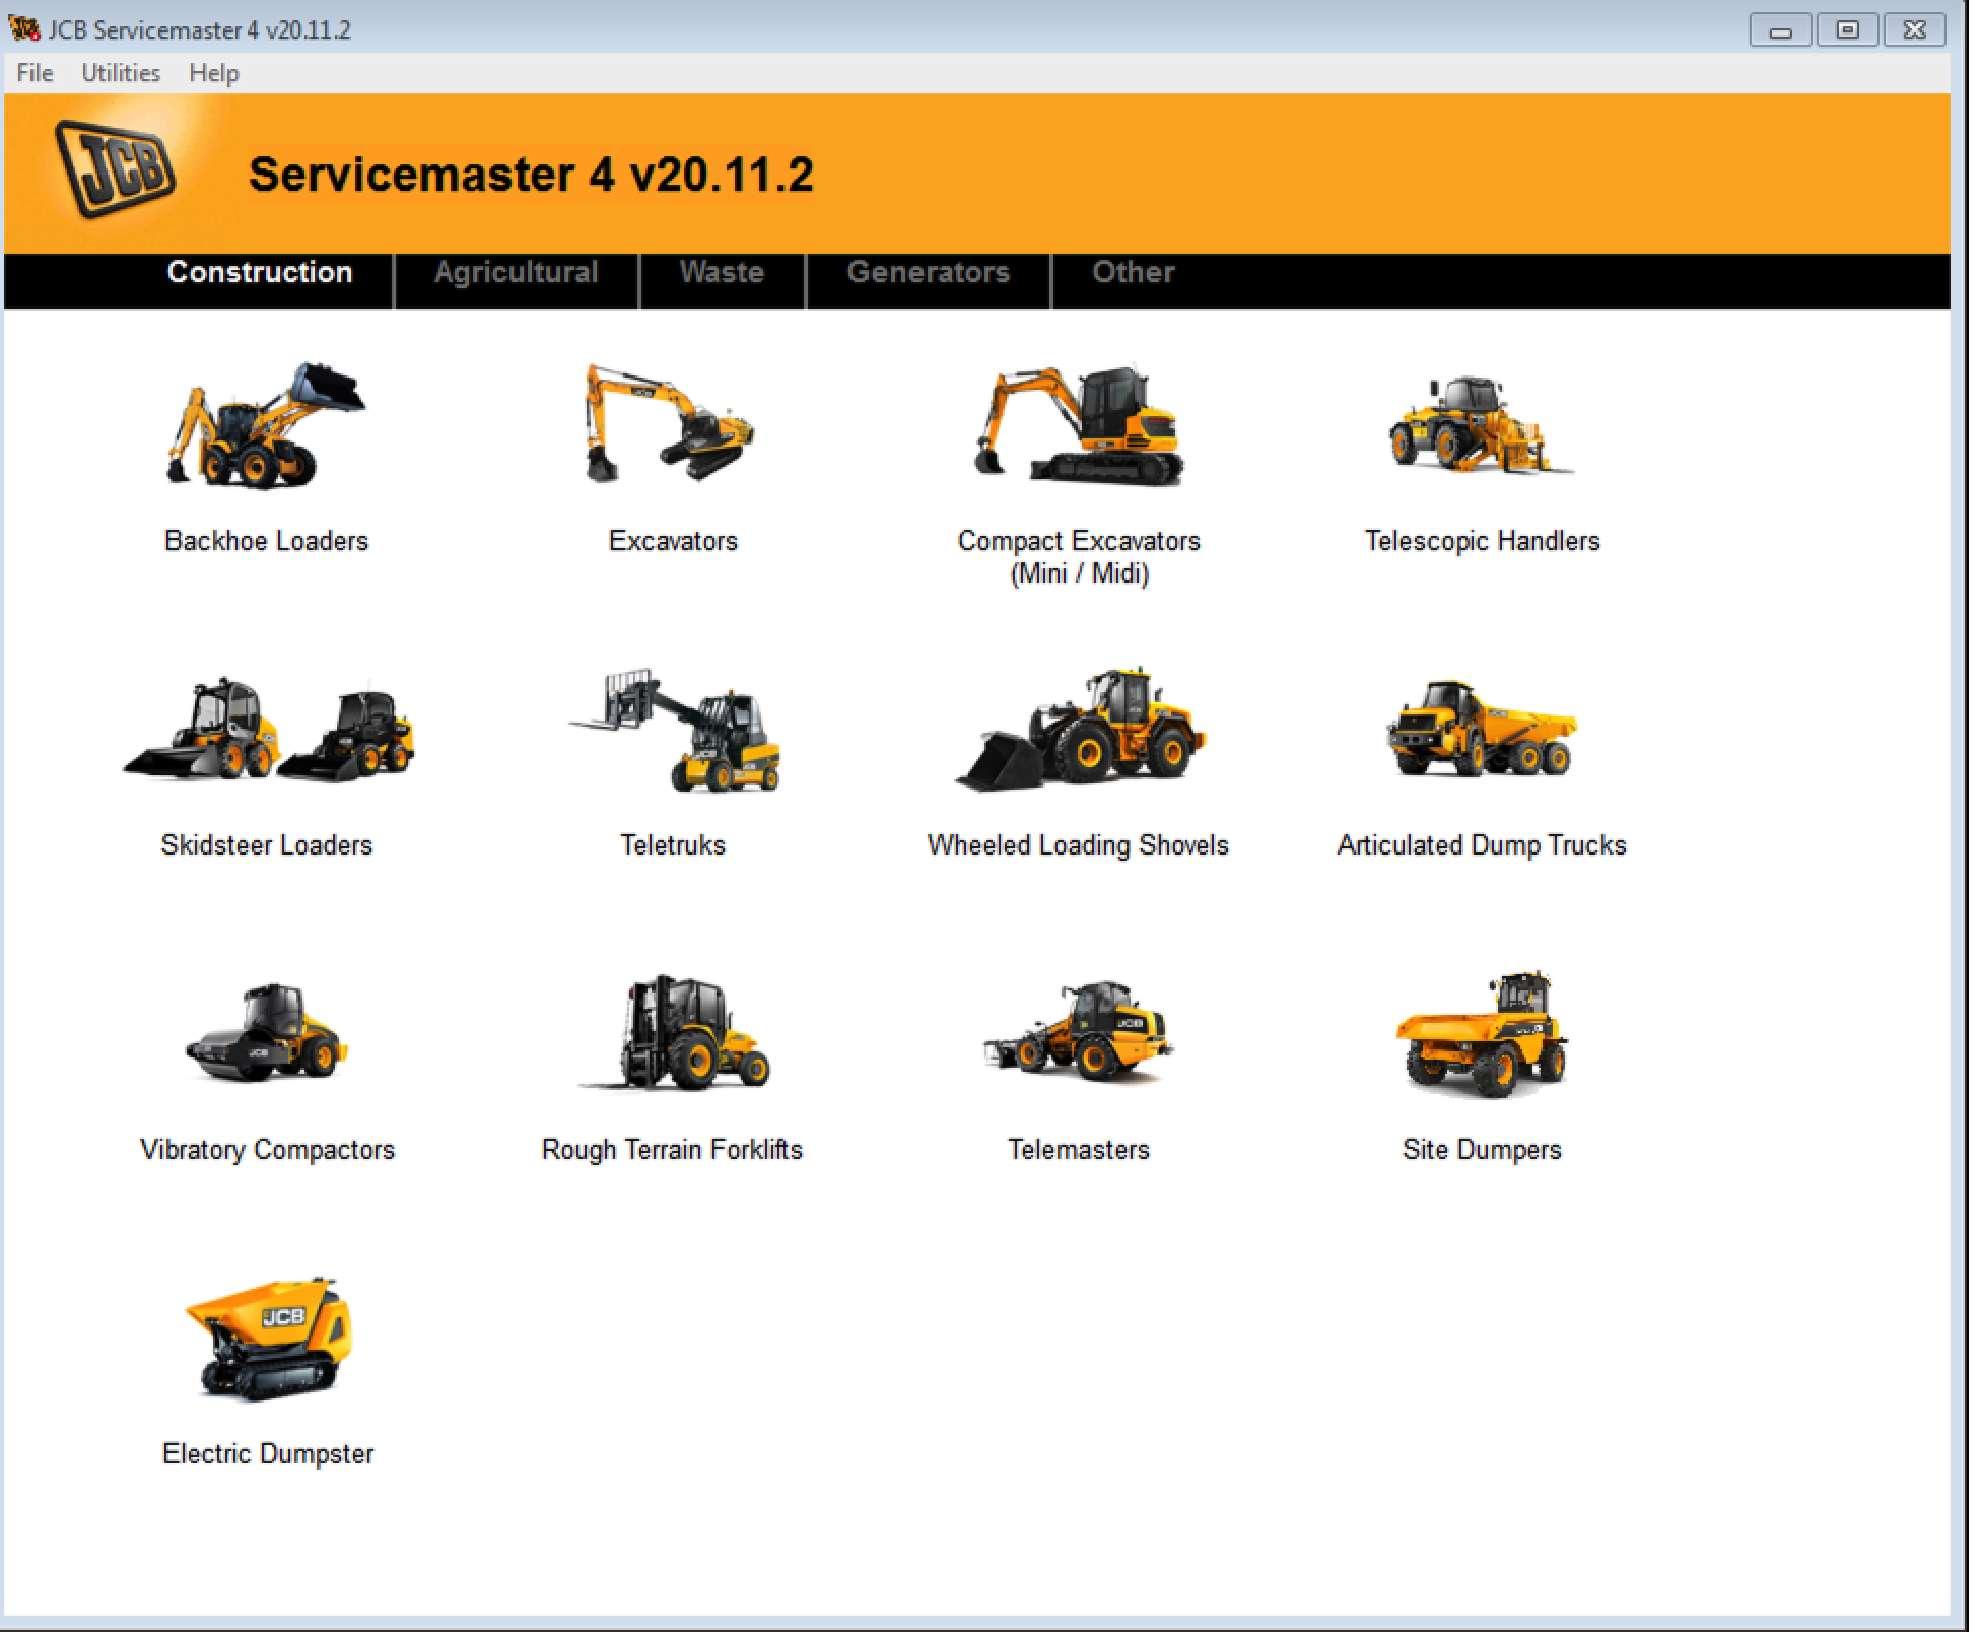 JCB ServiceMaster 4 Diagnostic Full v2.21 03.2021 SS-01